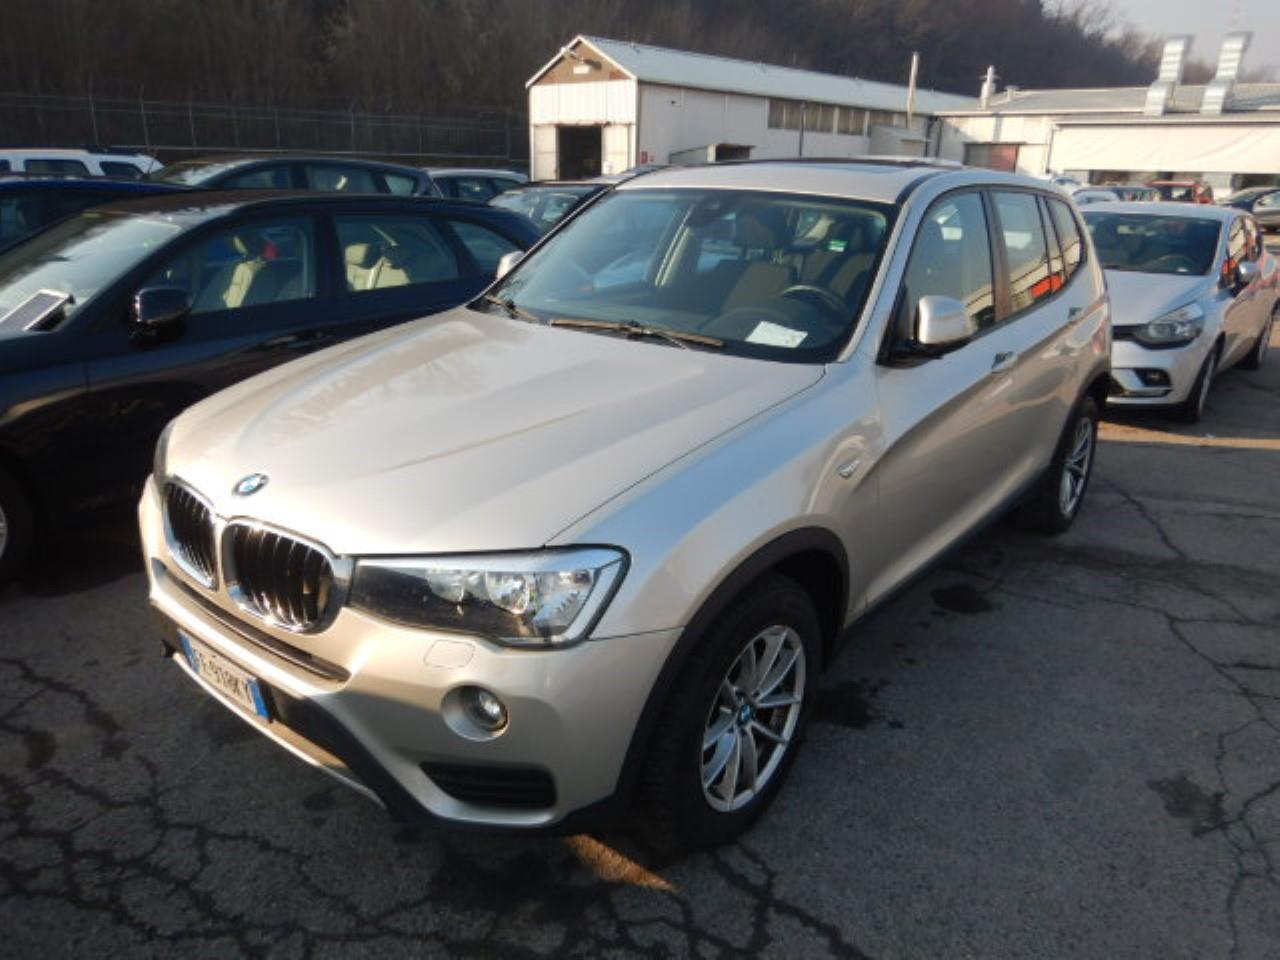 BMW X3 18d 150cv e6 ss s-drive ( cruise - navi - bt - clima bizona - tetto - cerchi 17 - pdc )